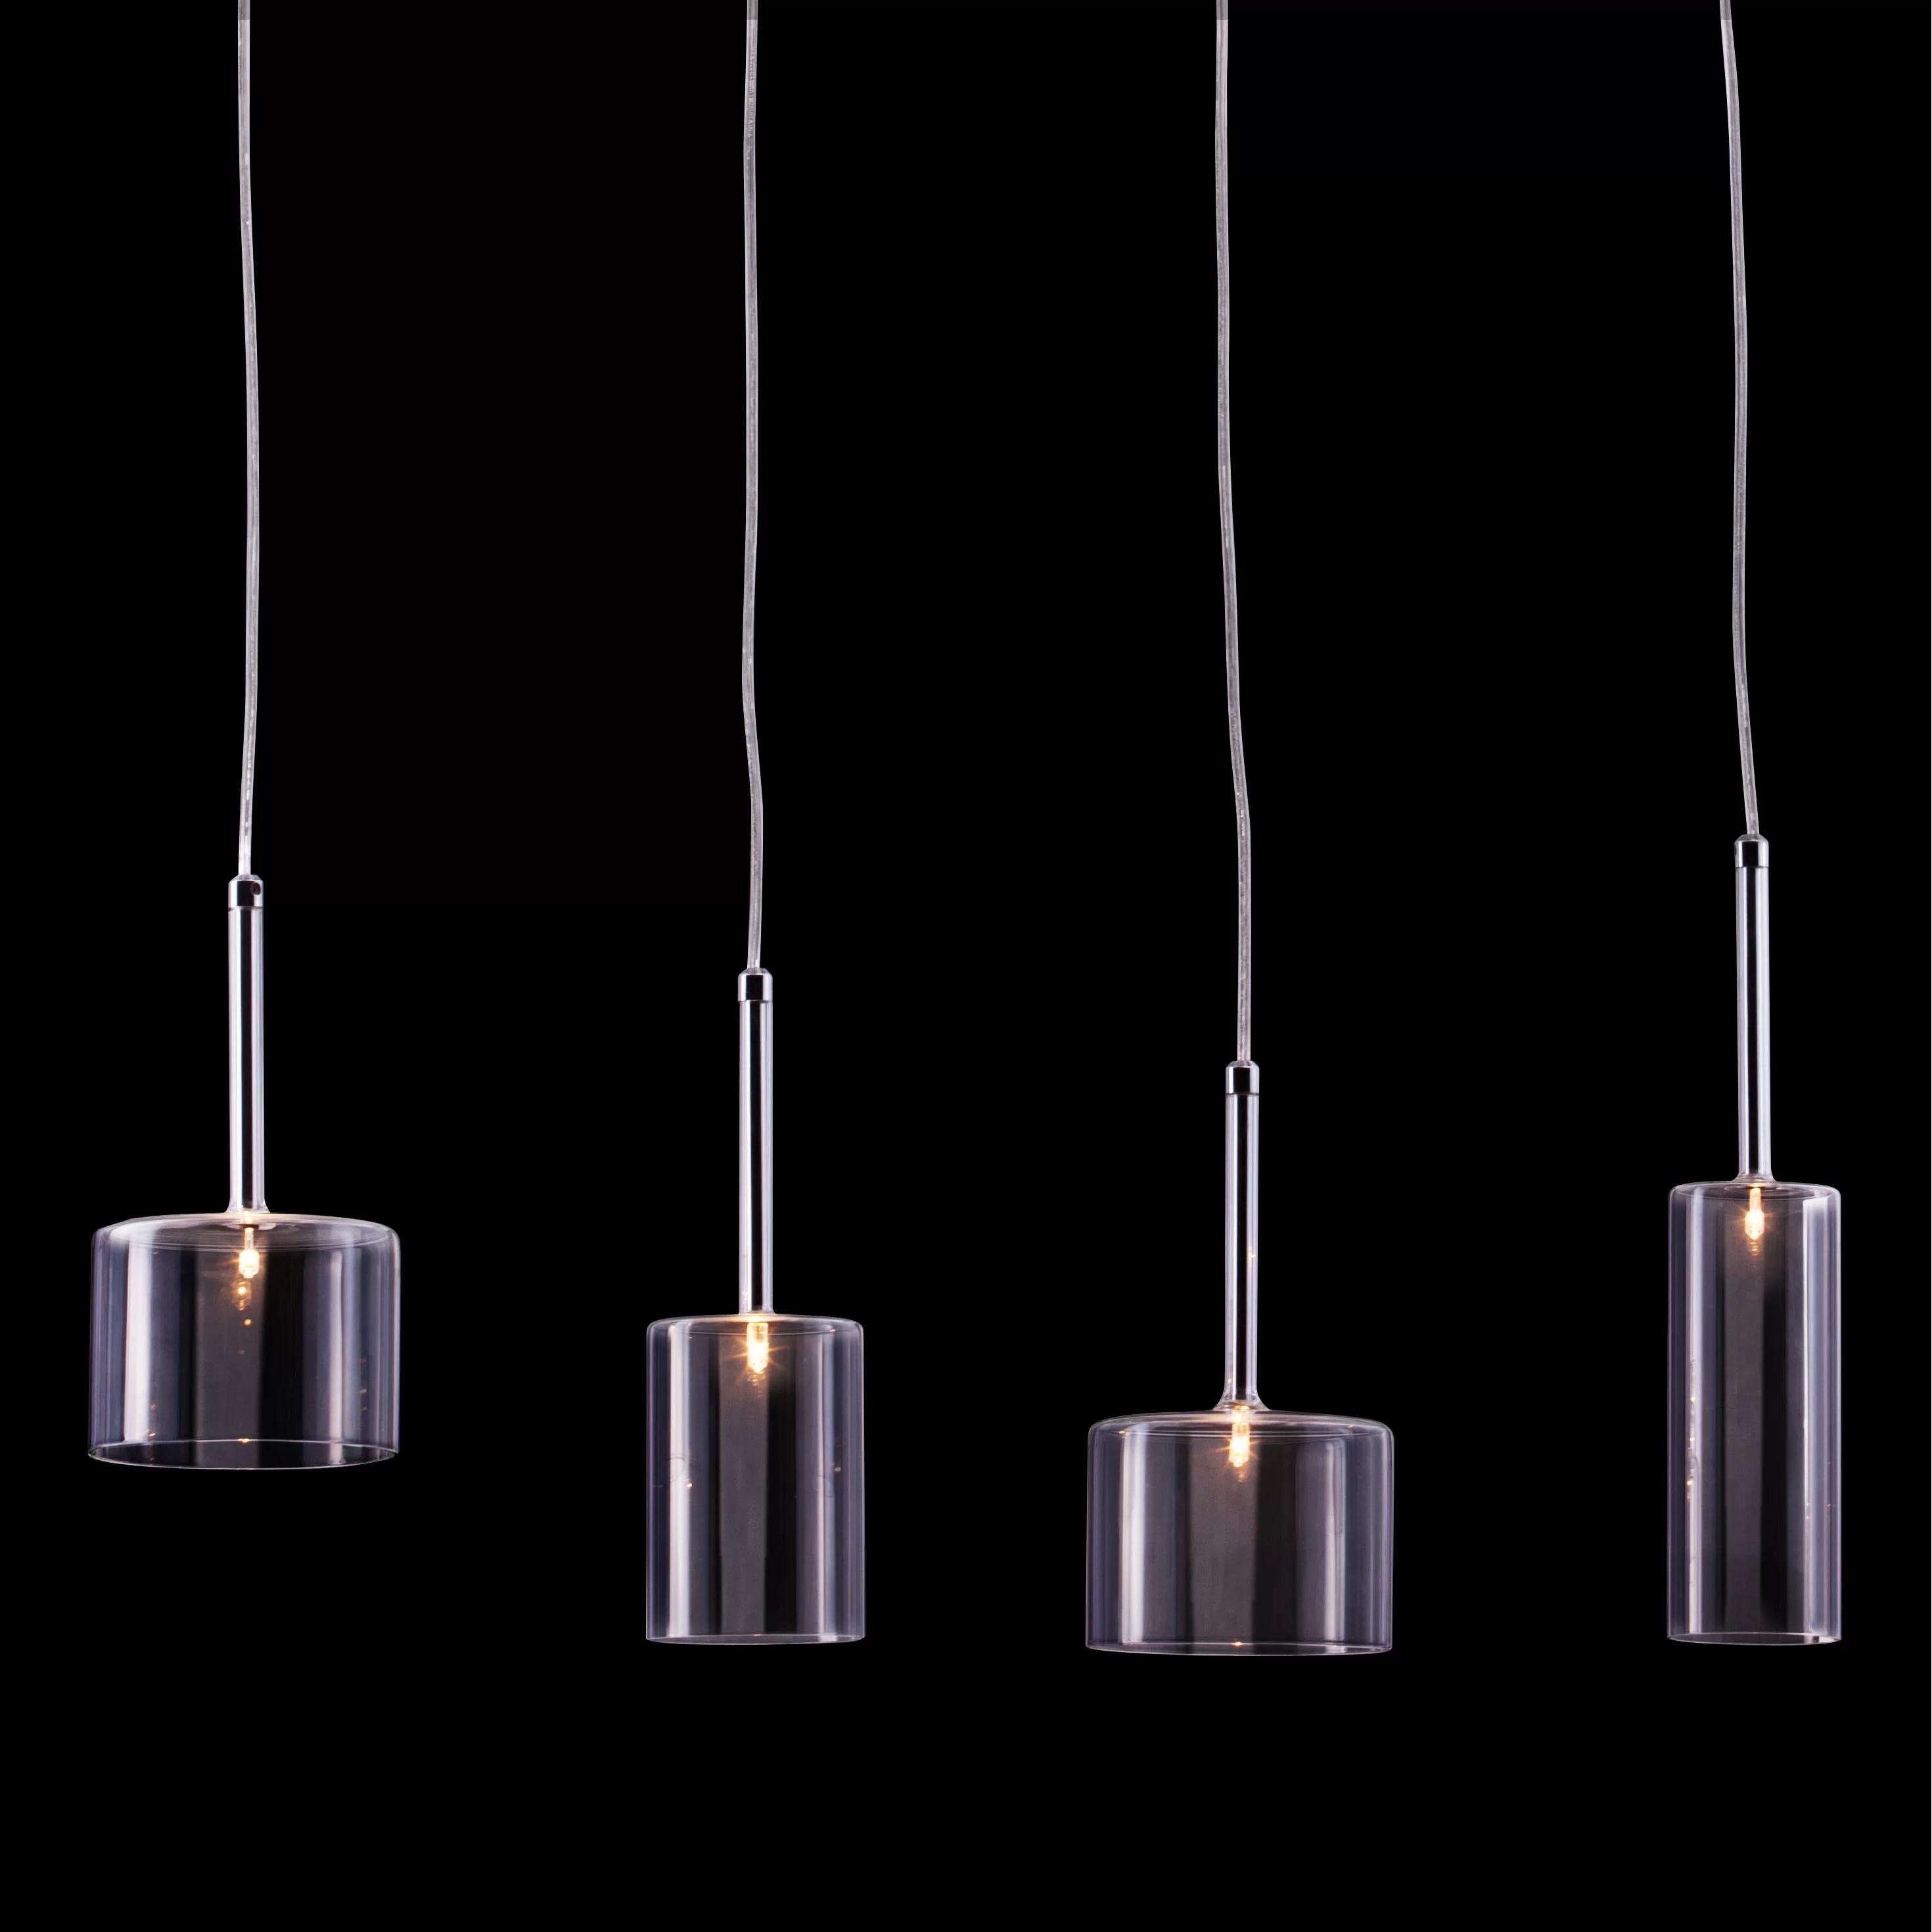 Four Pendant Light